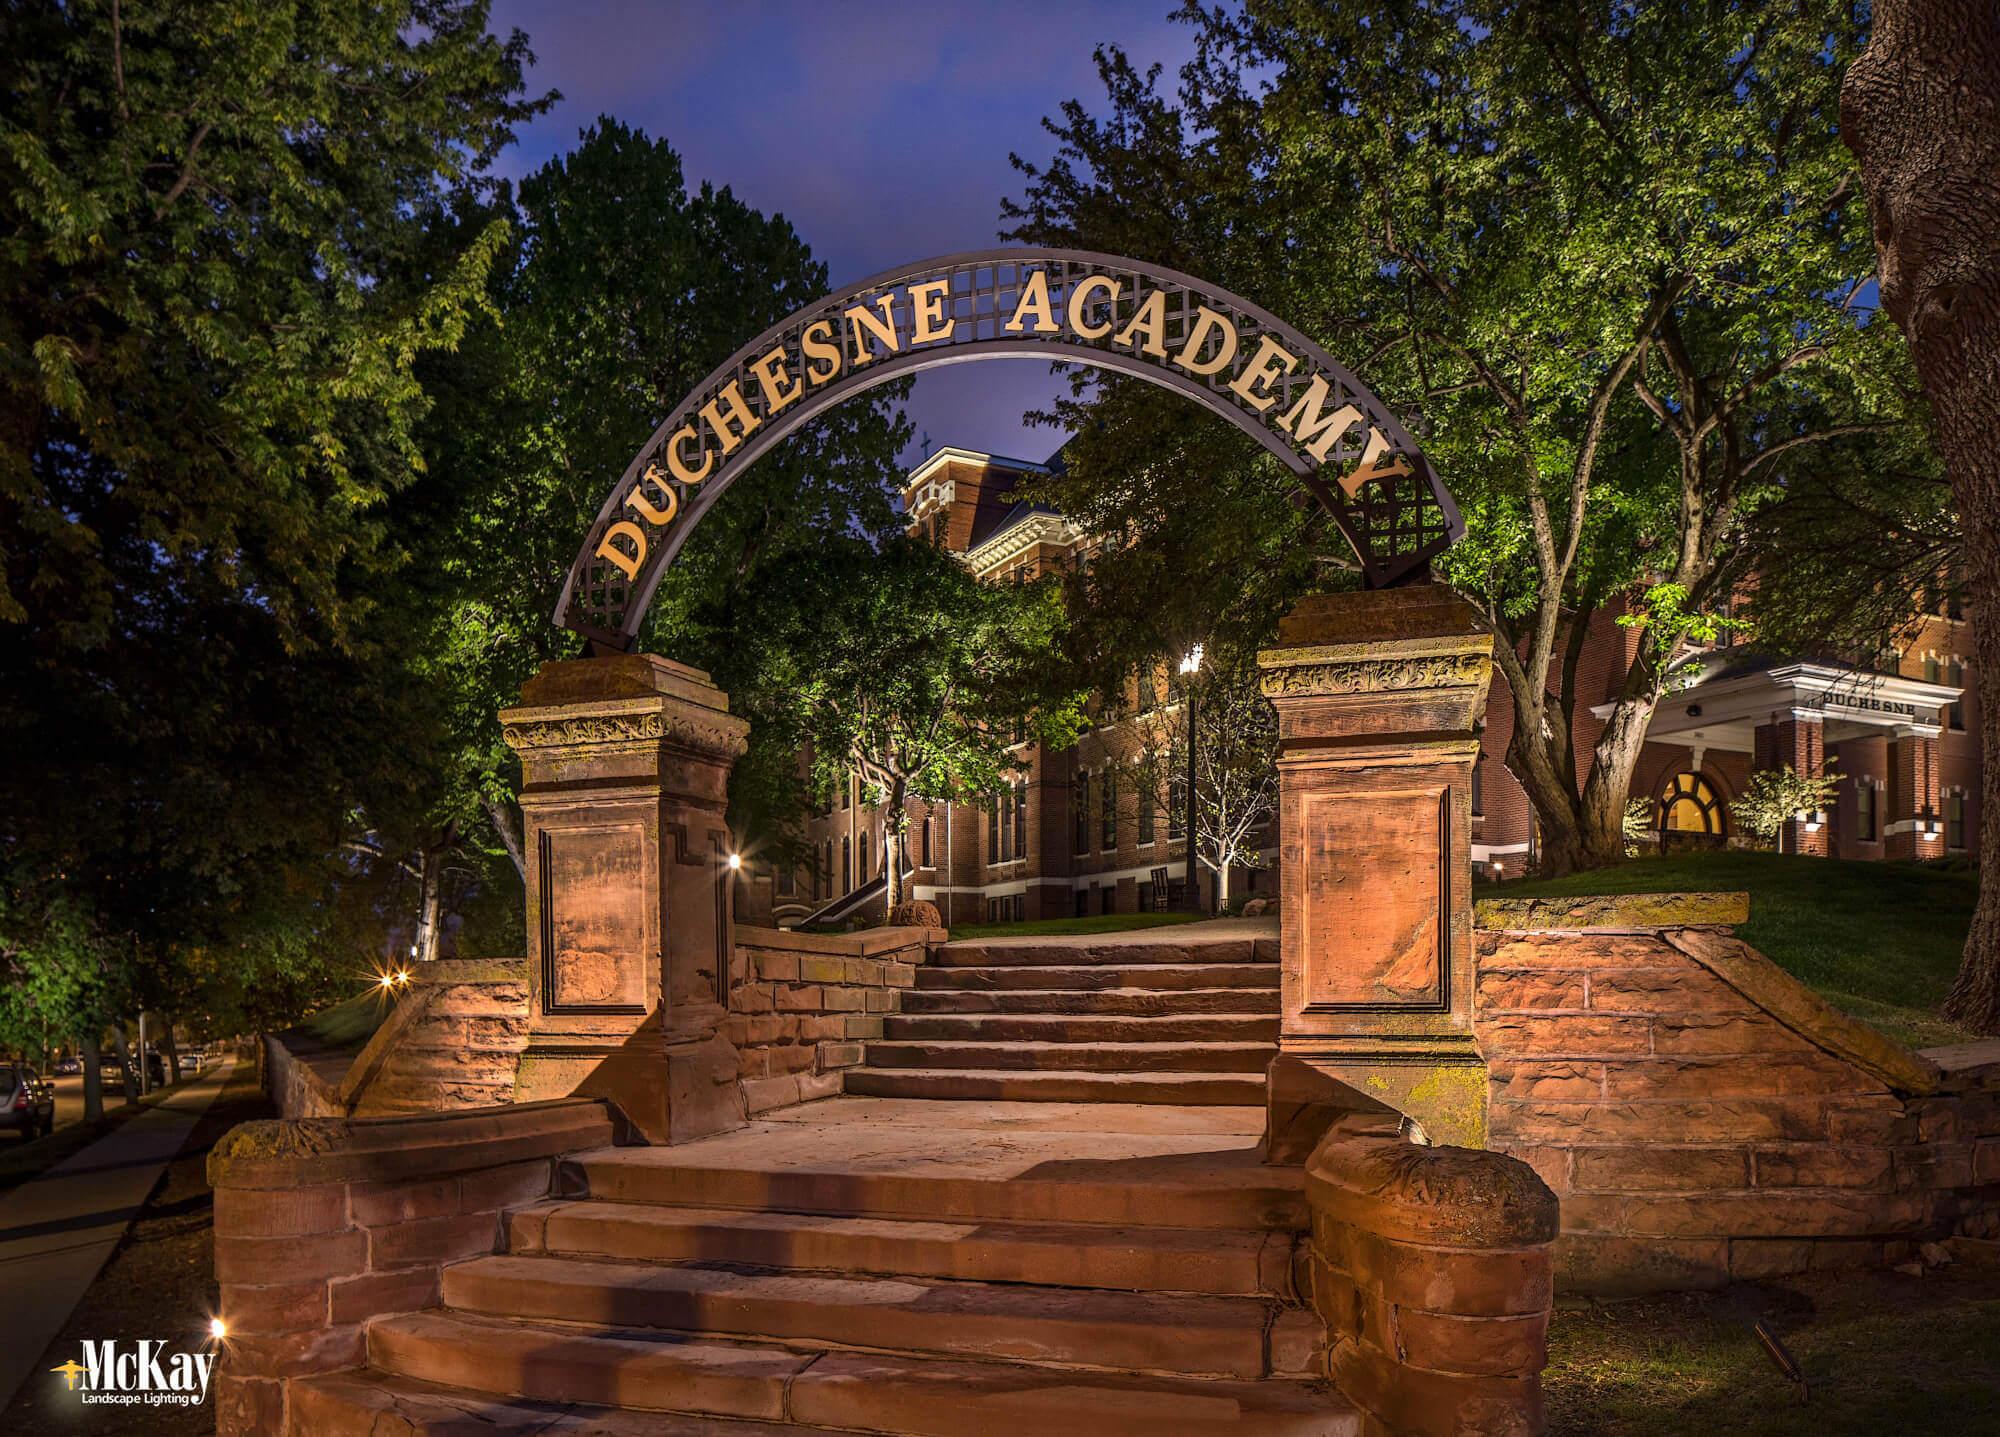 Exterior Stair Lighting Educational Facility Omaha Nebraska McKay Landscape Lighting DA 01